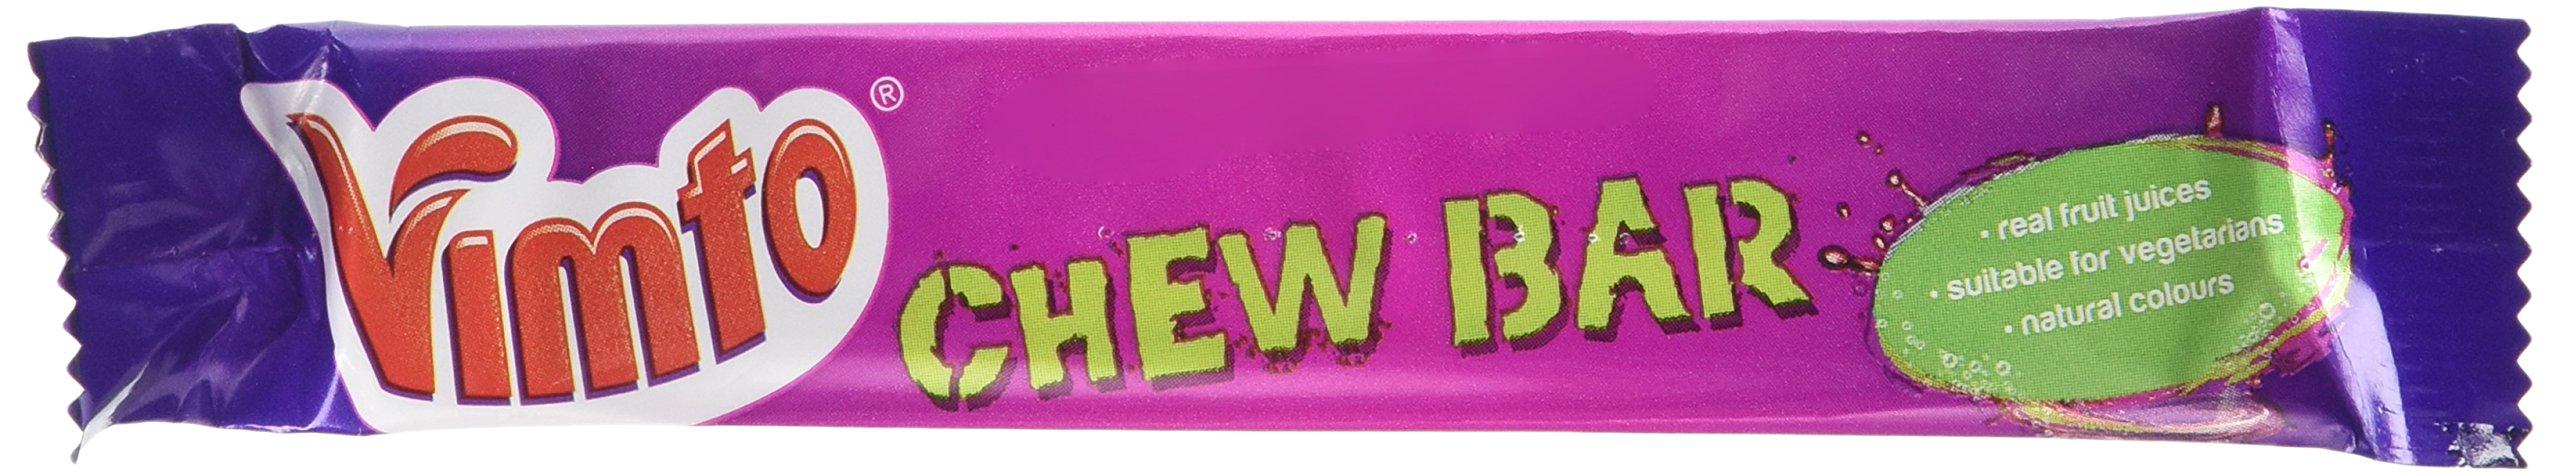 New Vimto Chew Bar x 1 Wholesale Box of 60